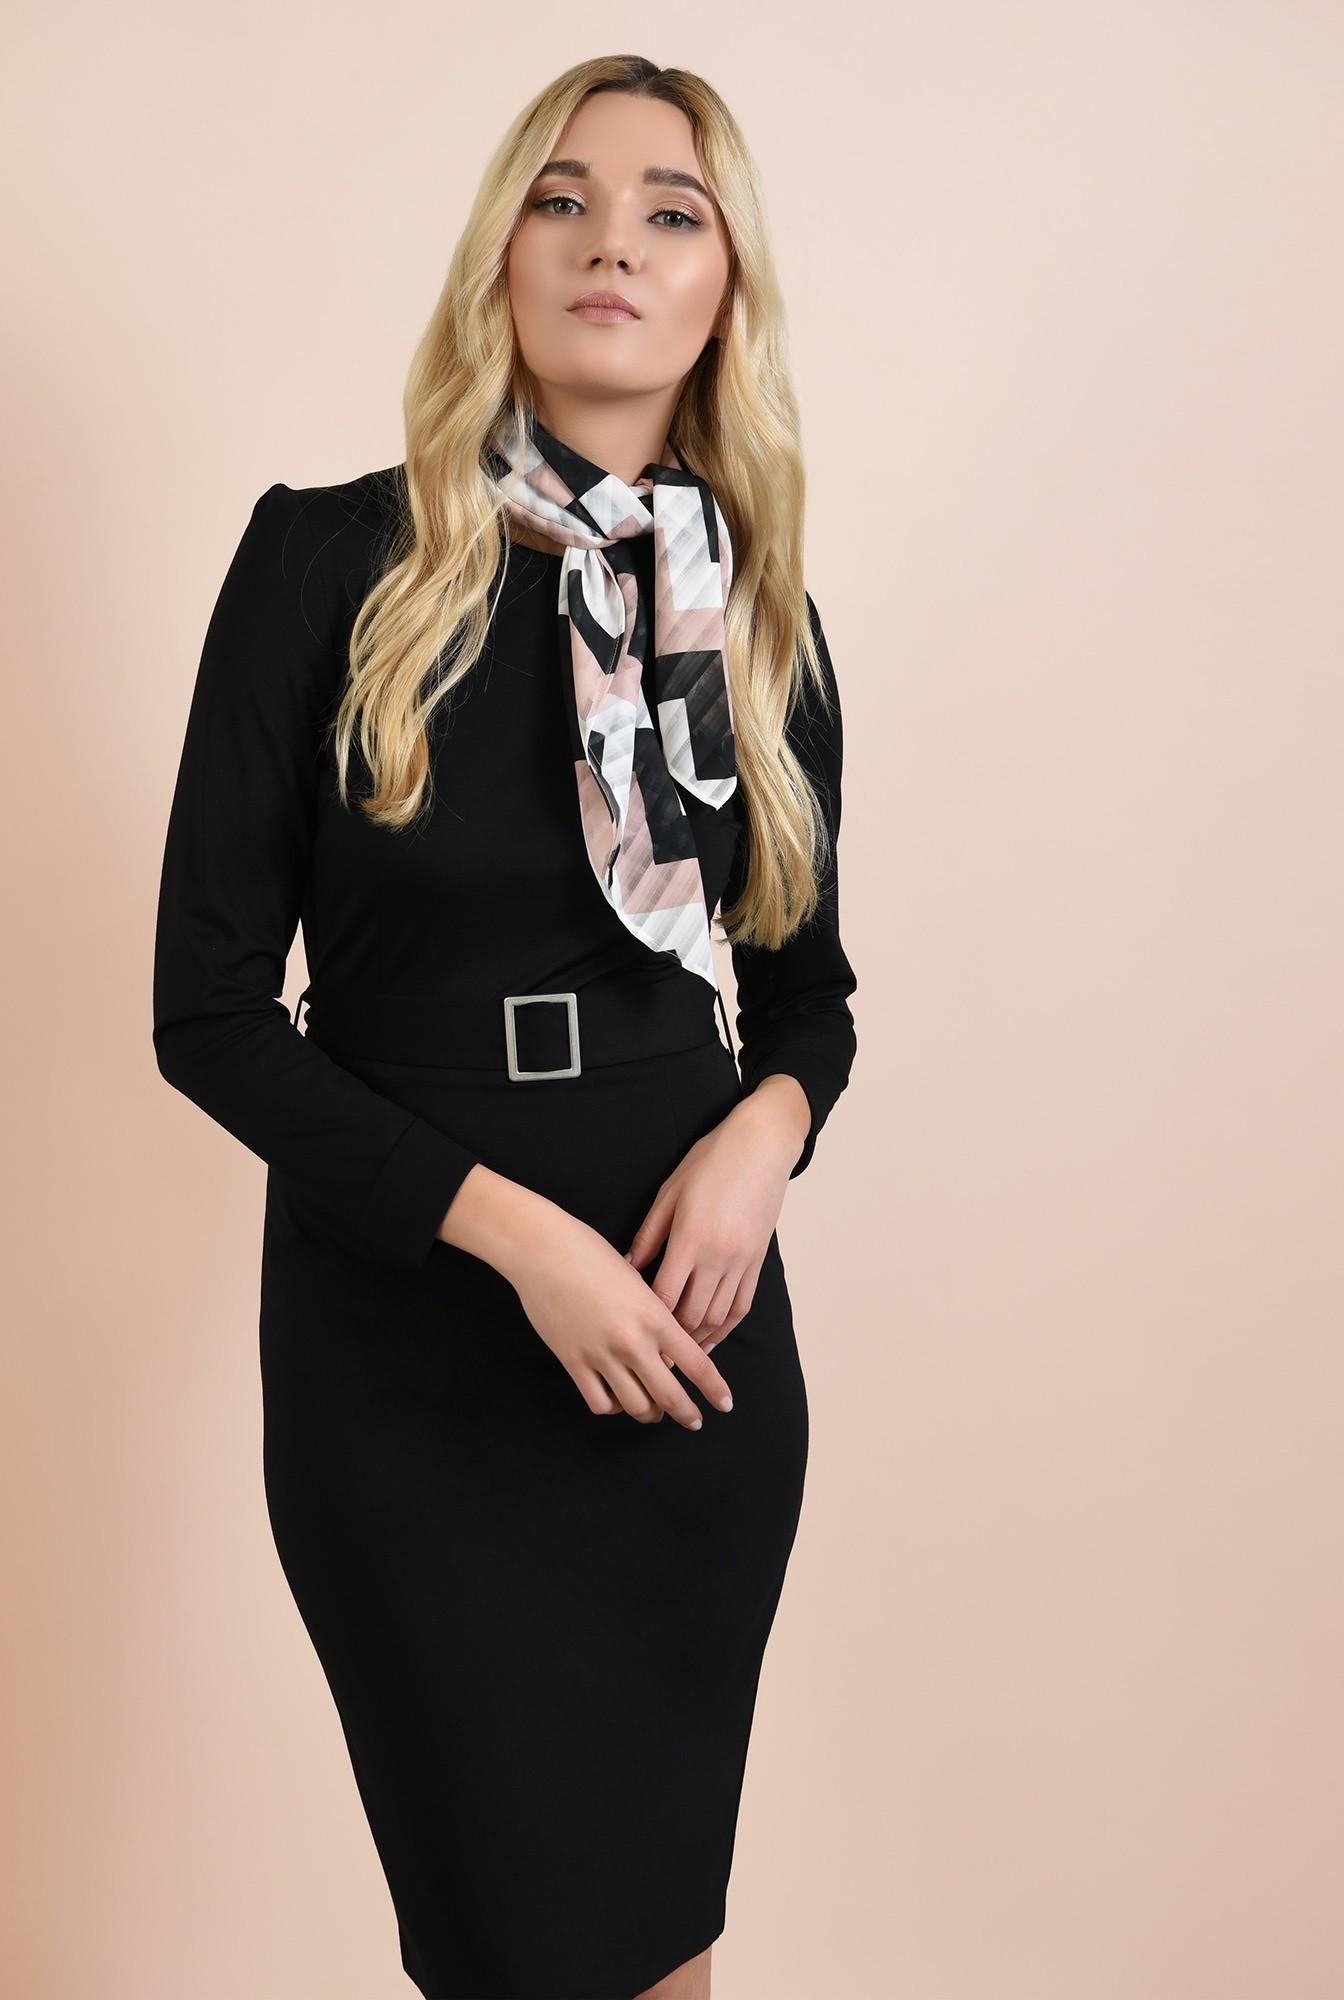 0 - 360 - rochie neagra, casual, bodycon, cu centura, catarama argintie